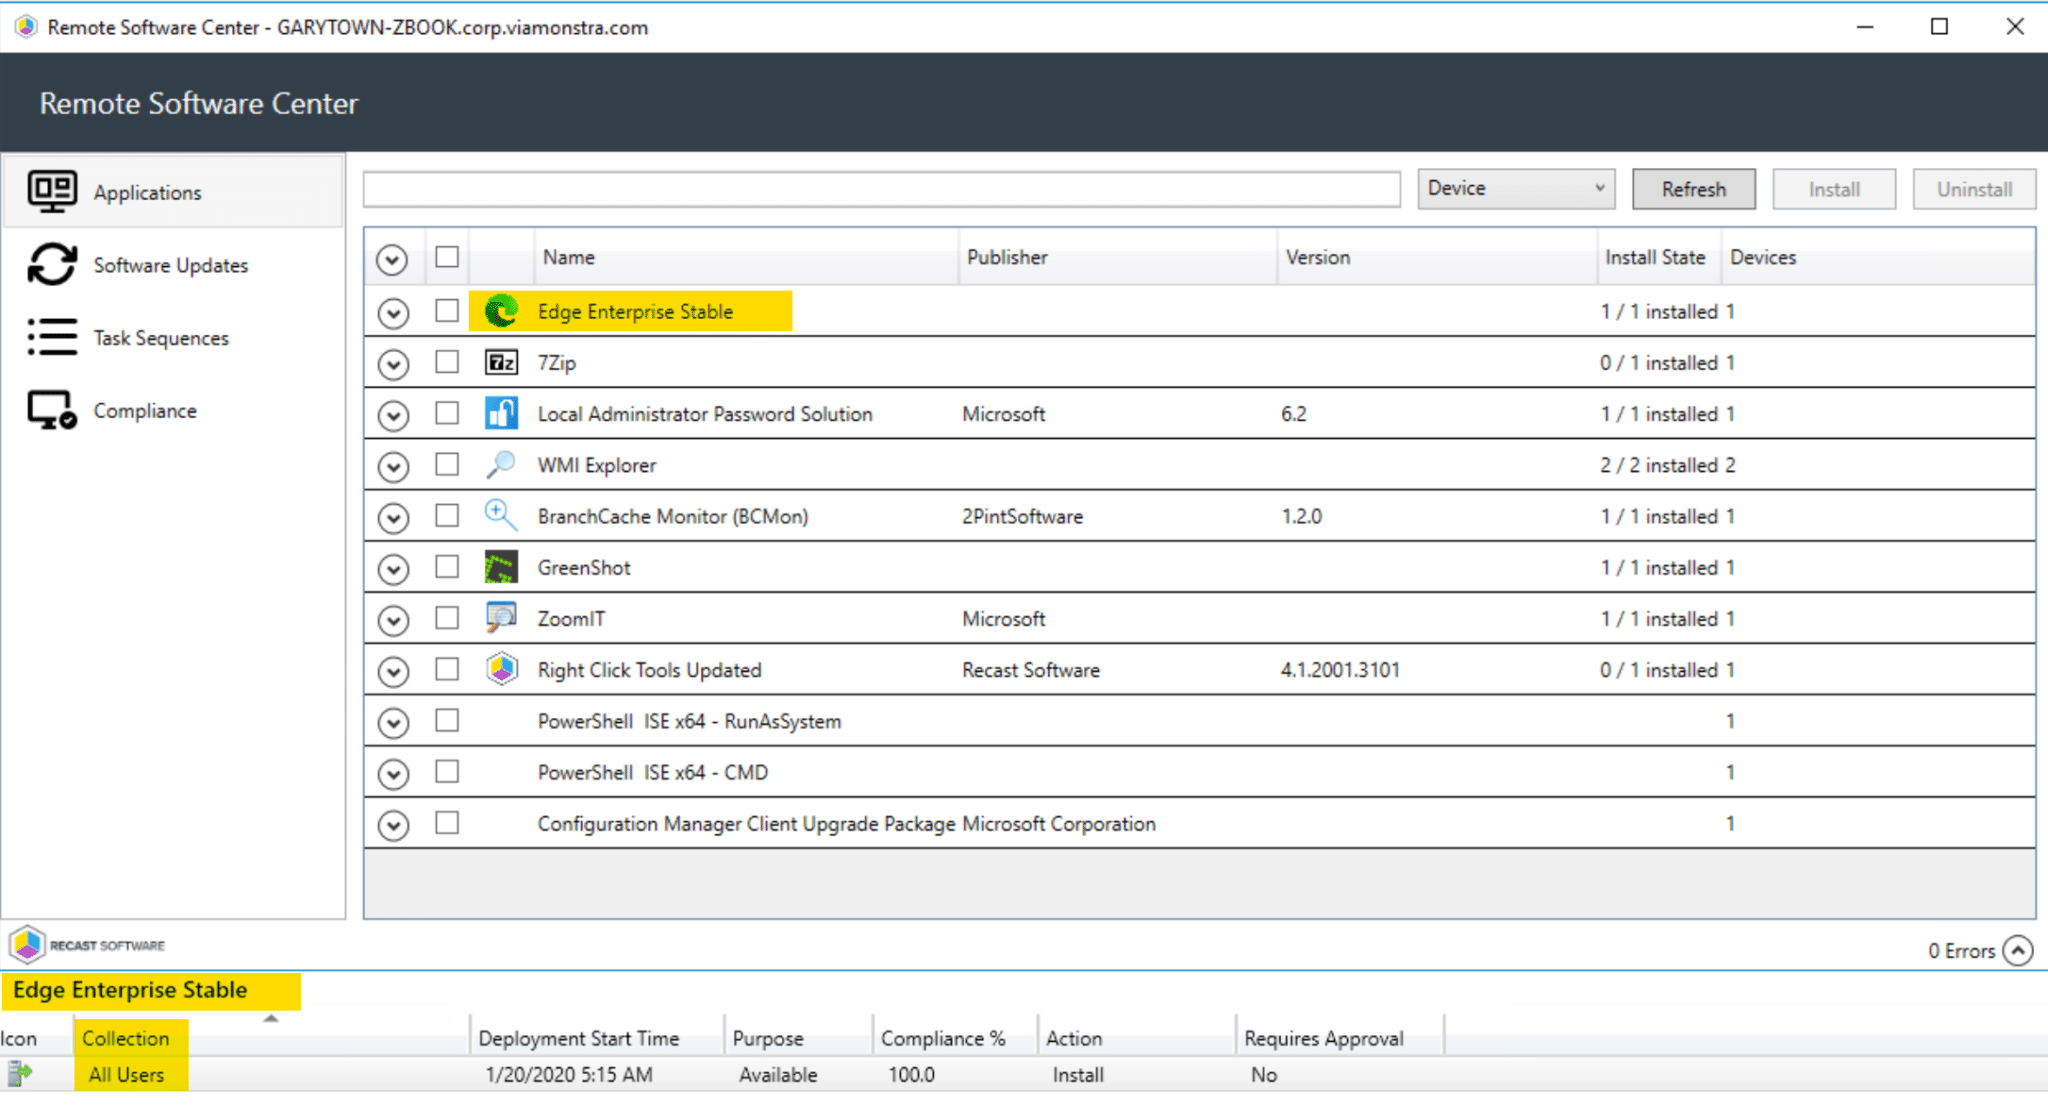 Remote Software Center Application Deployment